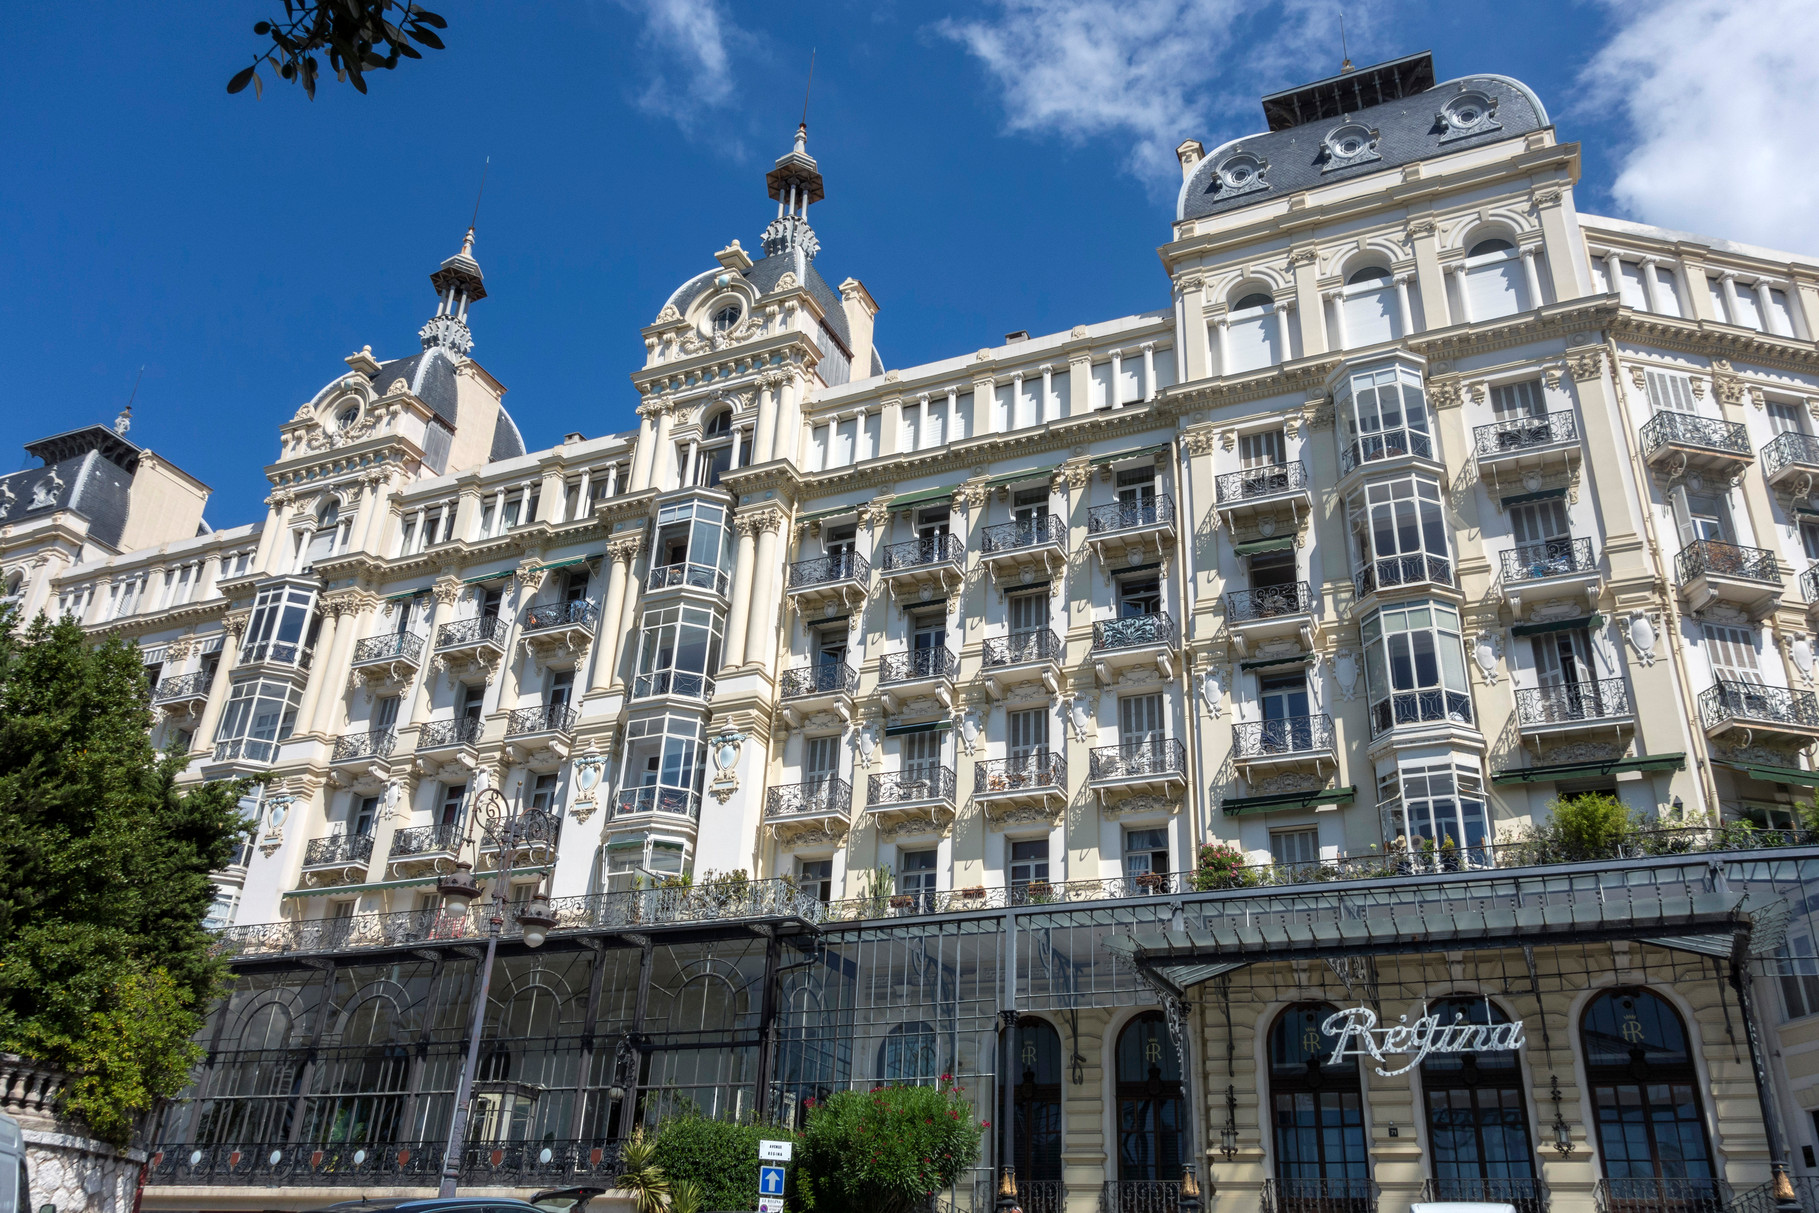 Palais Régina am Boulevard de Cimiez